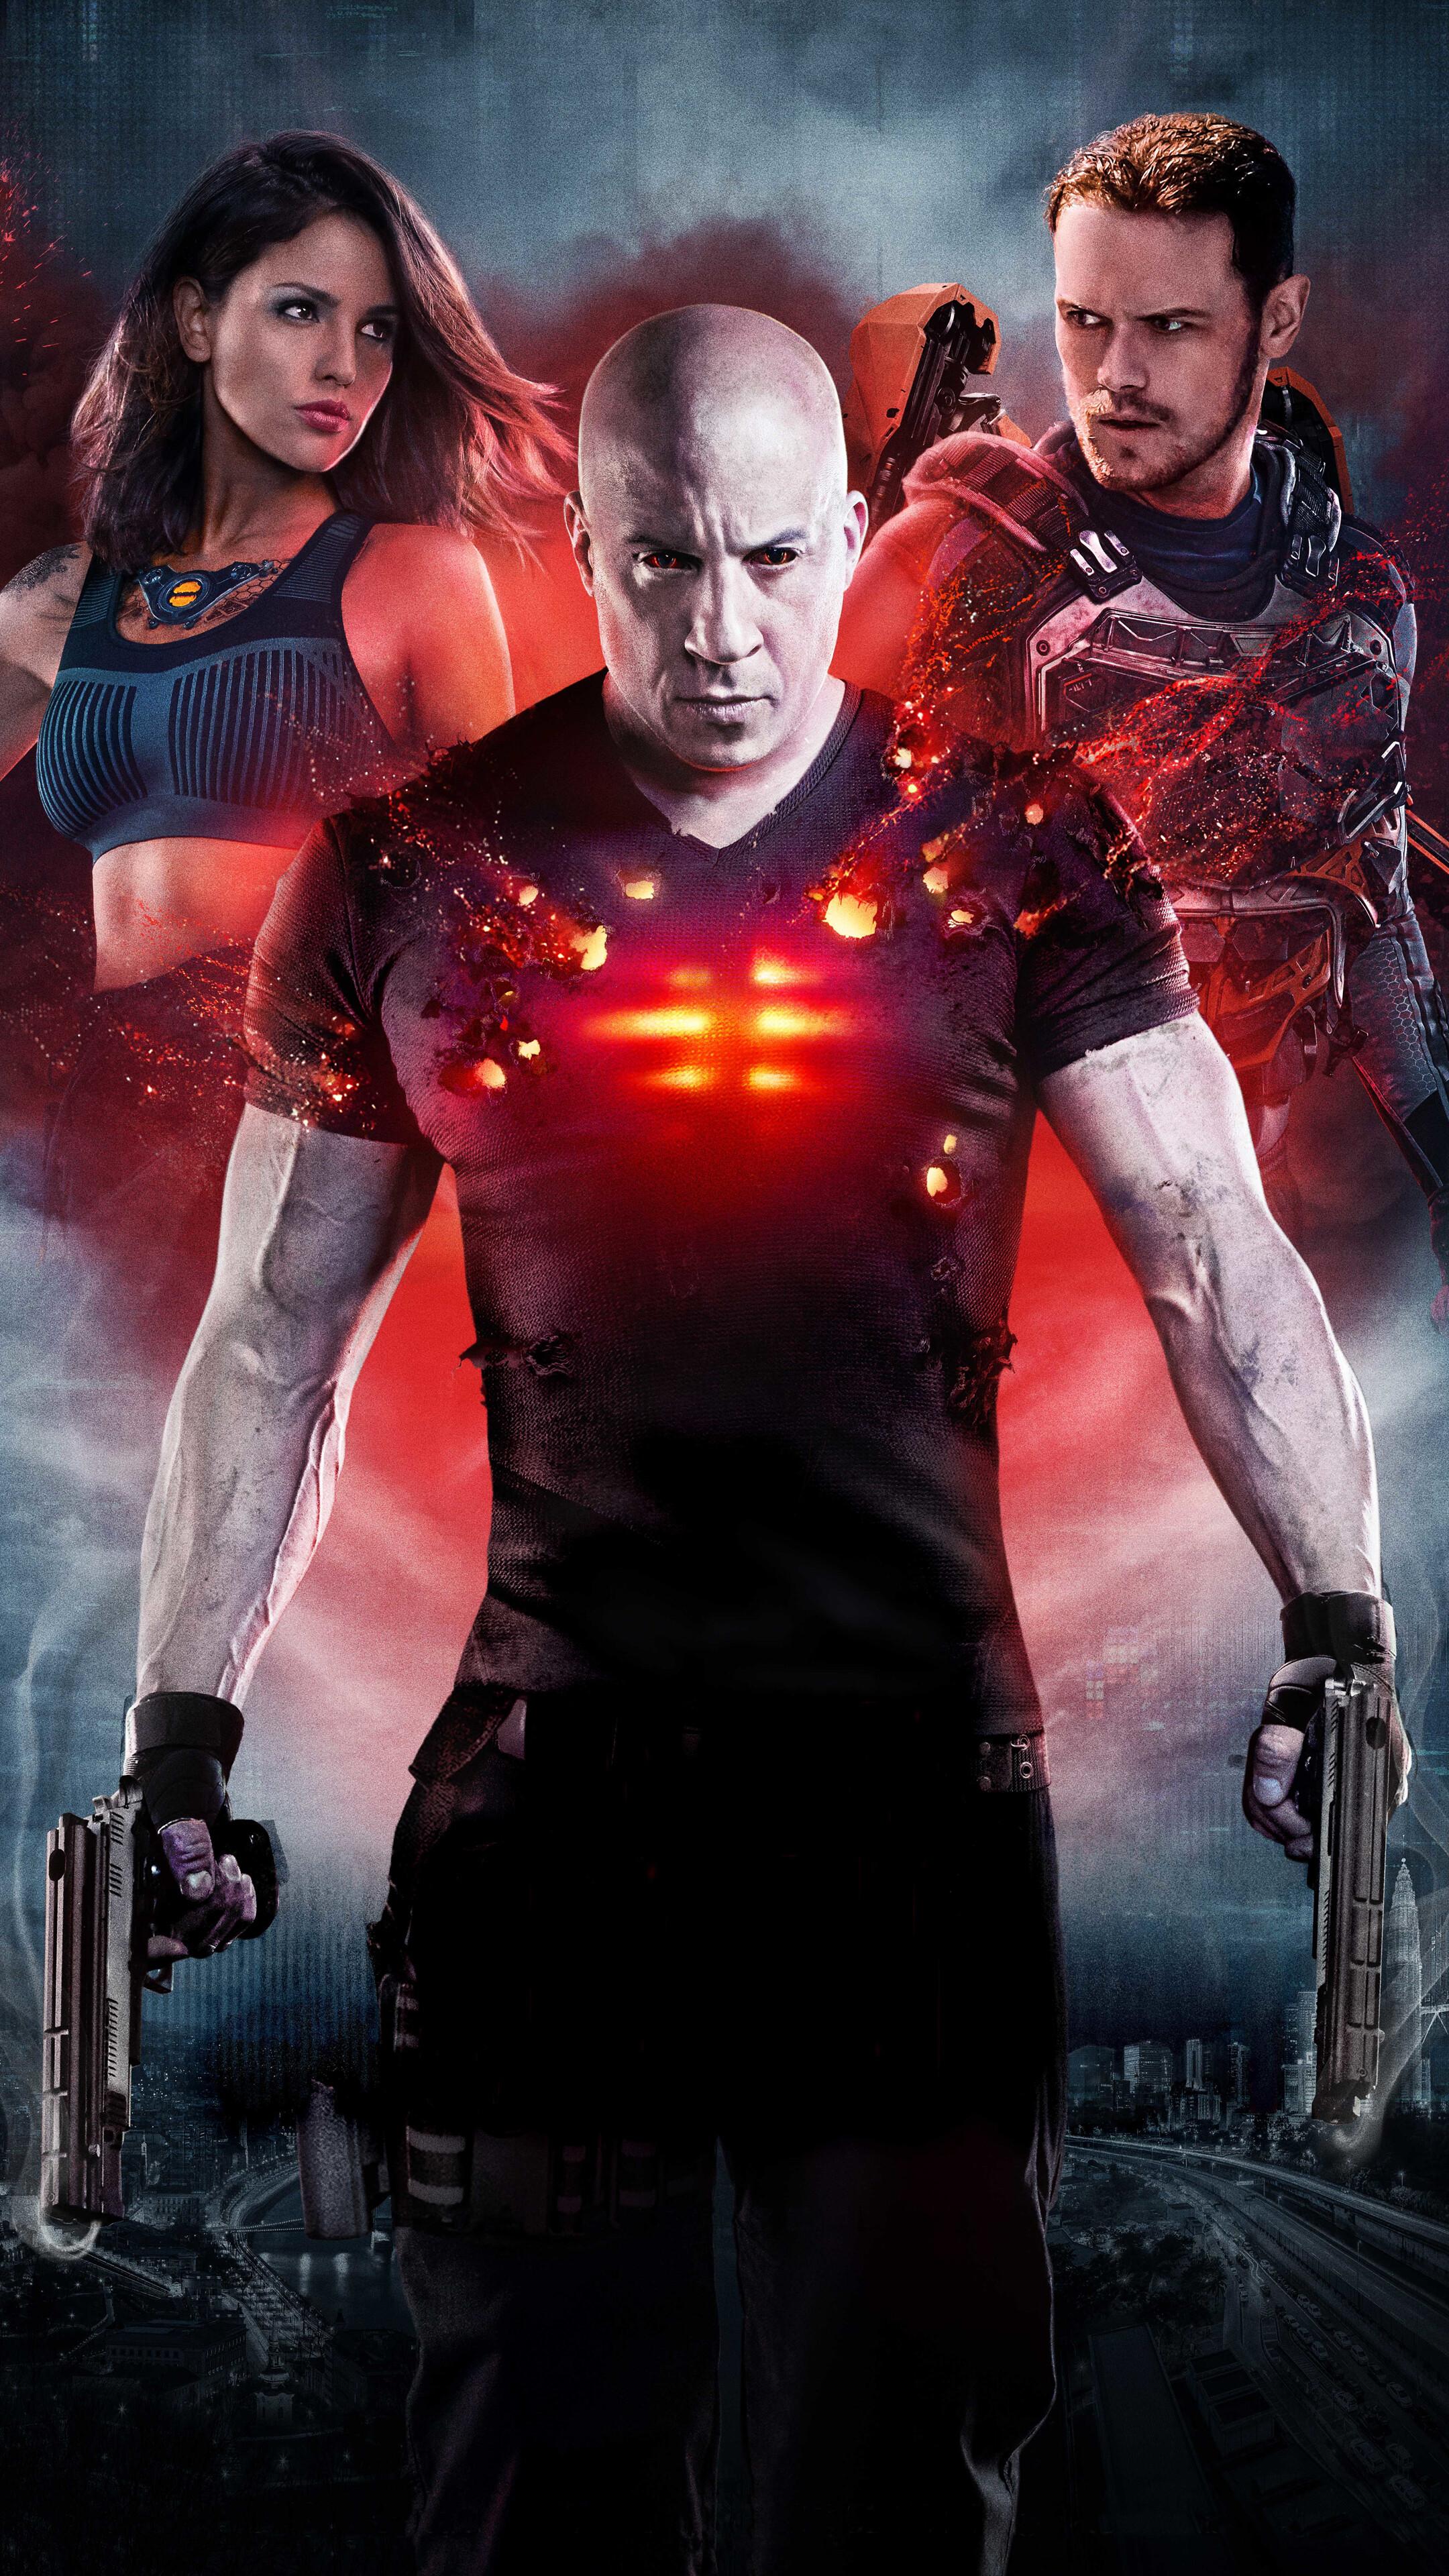 Bloodshot Movie 2020 Poster Cast Character 8K Wallpaper 7947 2160x3840